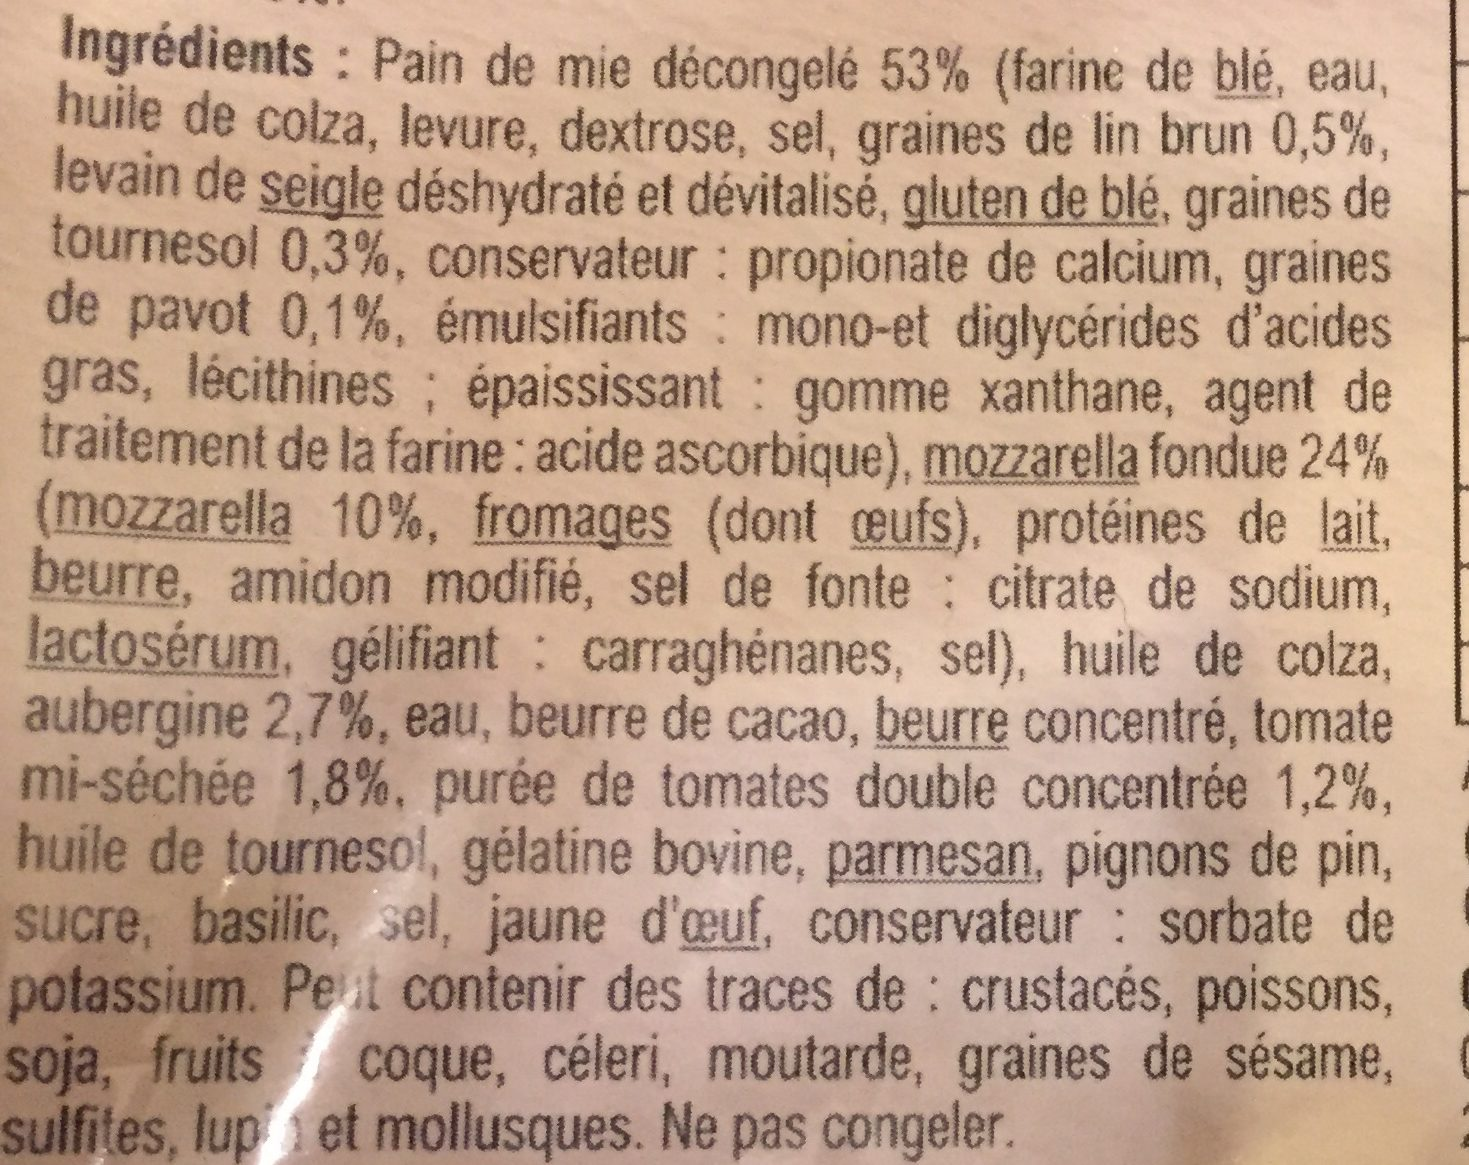 Croque monsieur mozzallera sauce aubergine tomate - Ingredients - fr